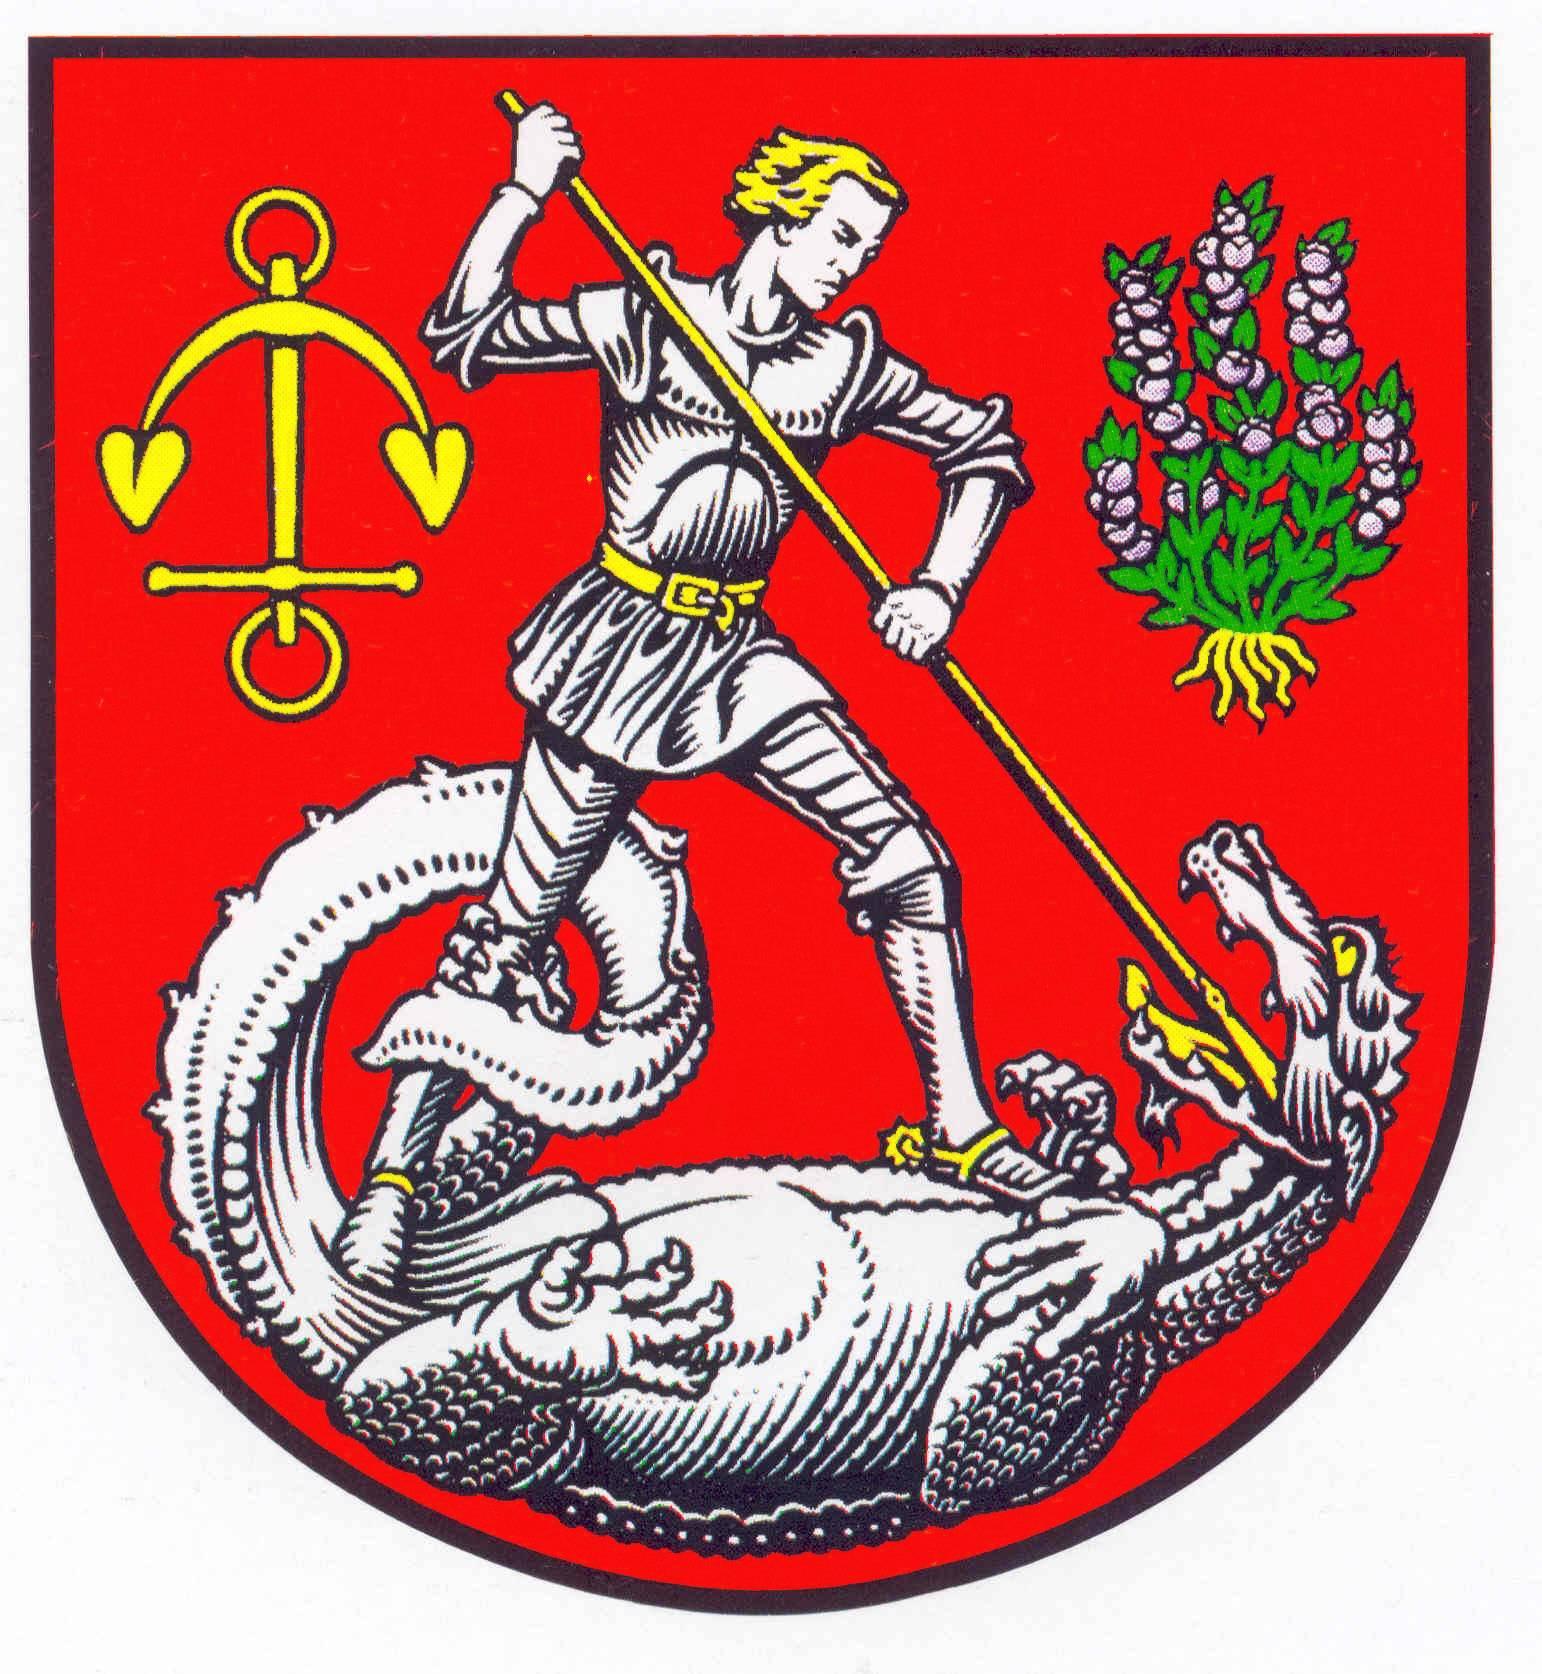 Wappen StadtHeide, Kreis Dithmarschen